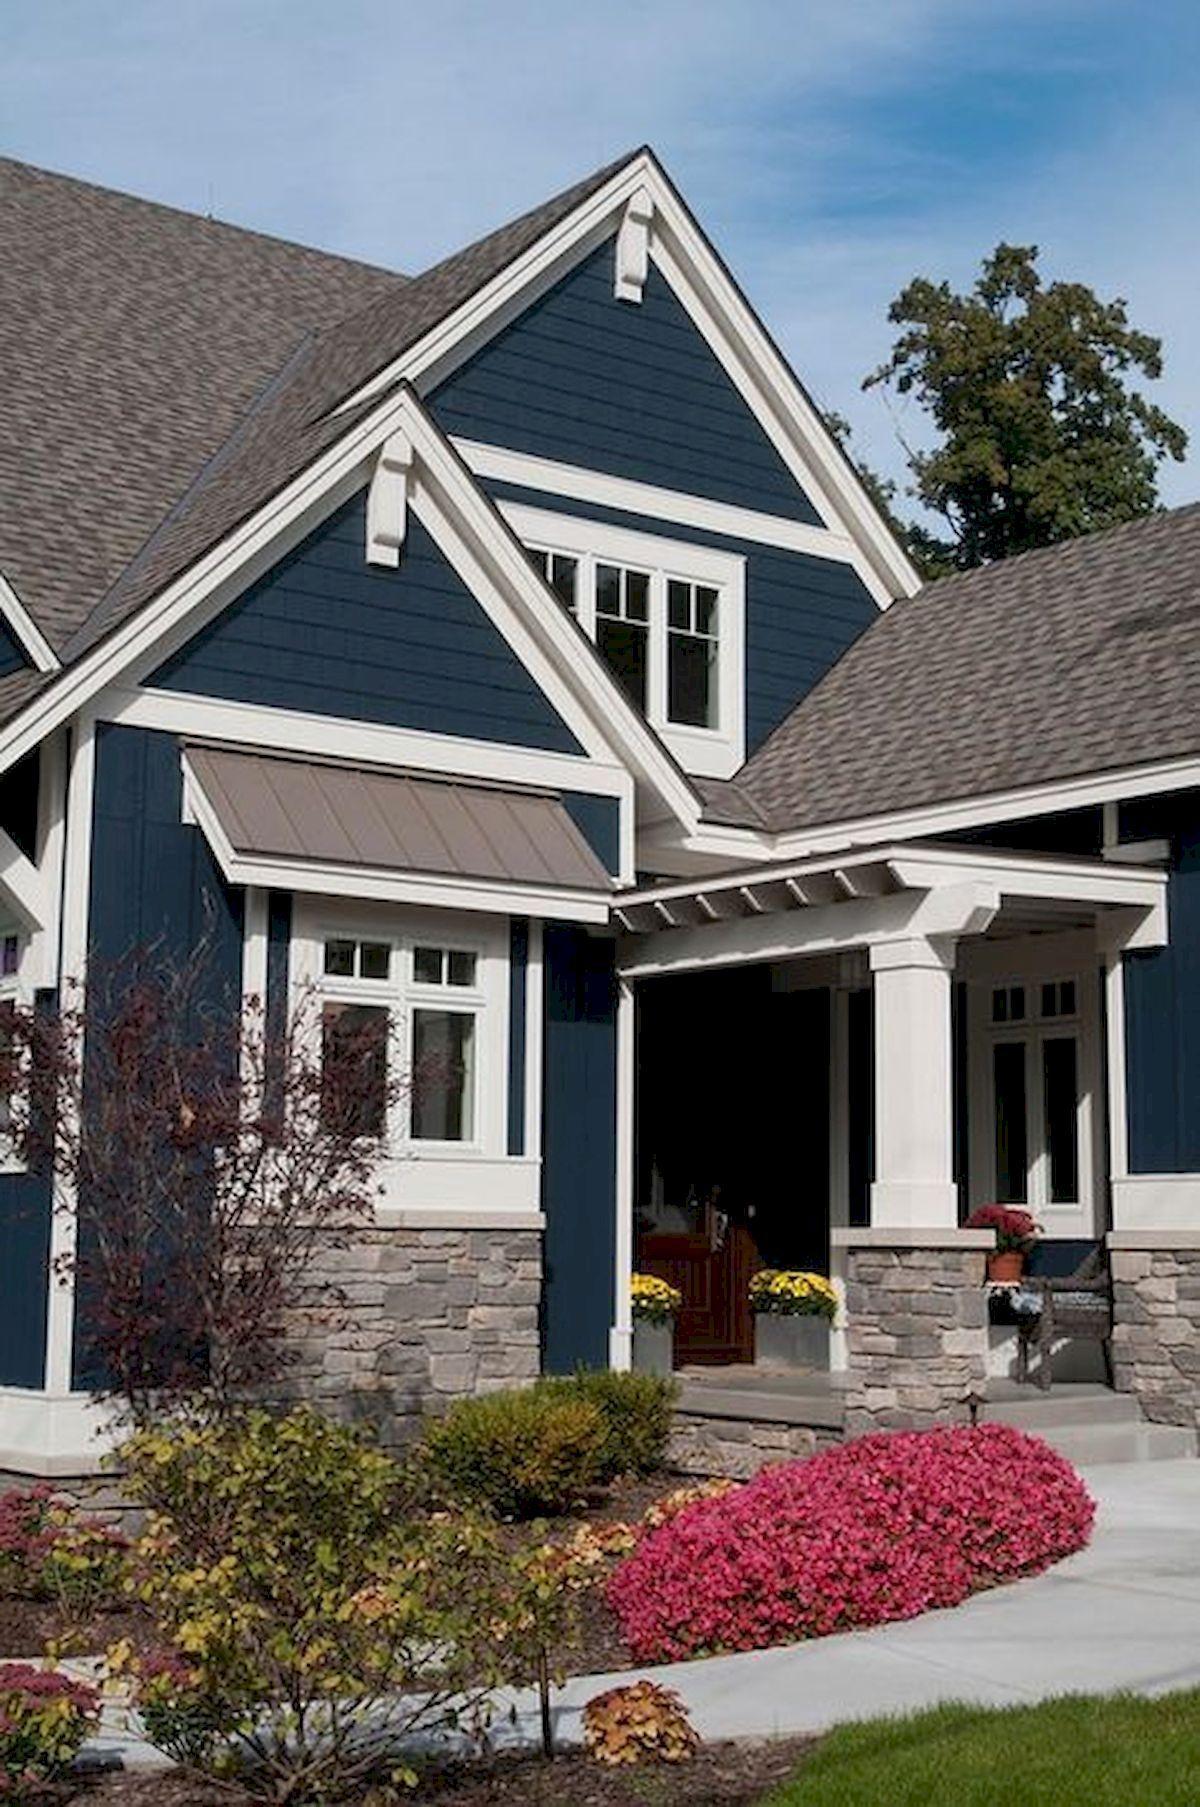 Gorgeous 20 Best 2019 Exterior House Trends Ideas Https Coachdecor Com 20 Best 2019 Exteri House Exterior Blue Modern Farmhouse Exterior Exterior House Color